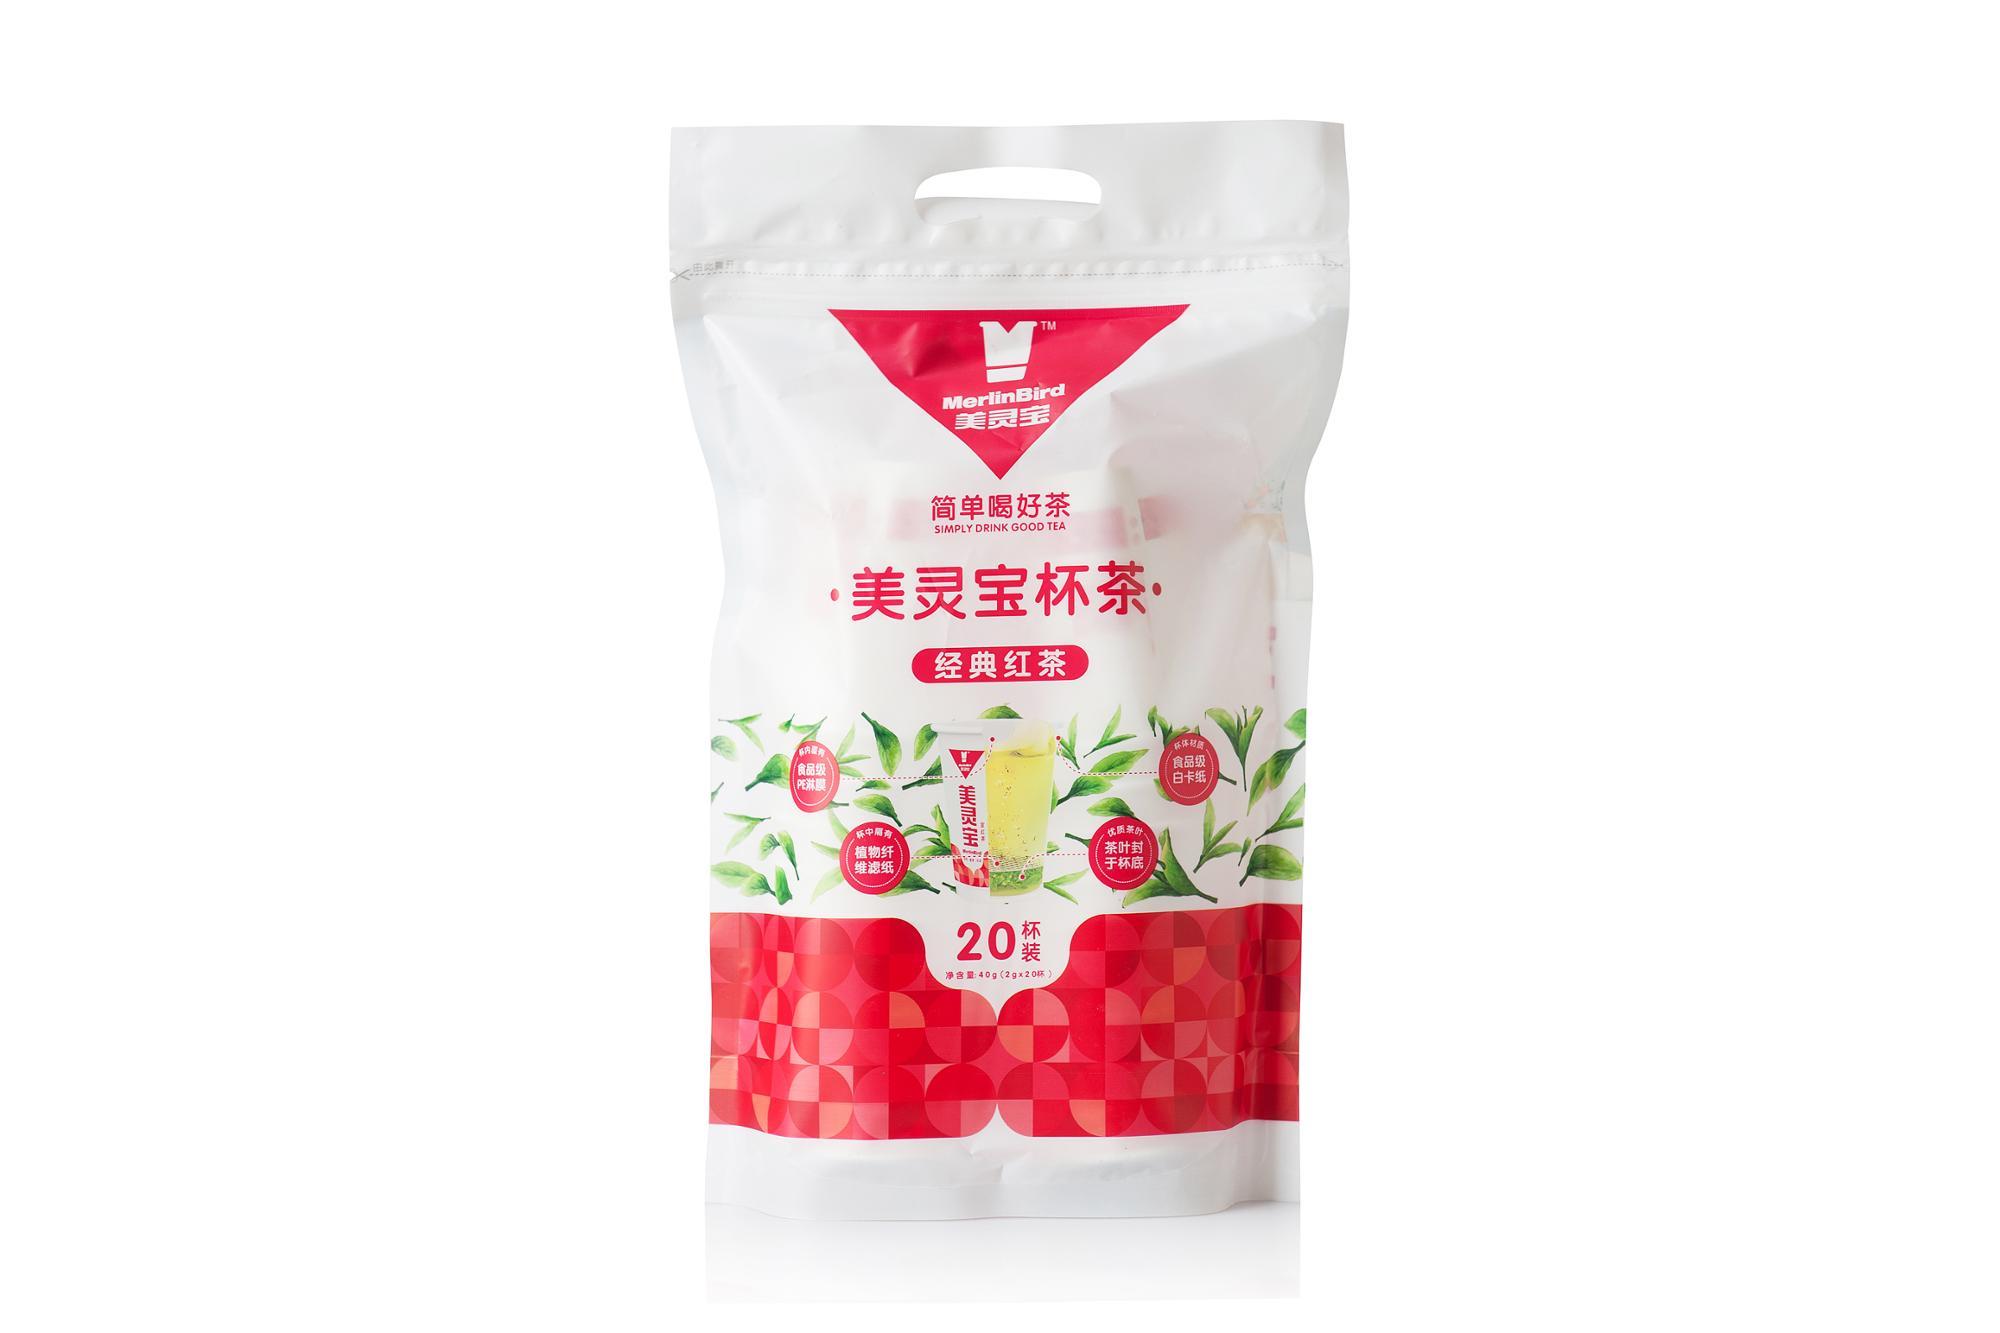 Herbal Tea with Good Quality with Bag Packed - 4uTea   4uTea.com